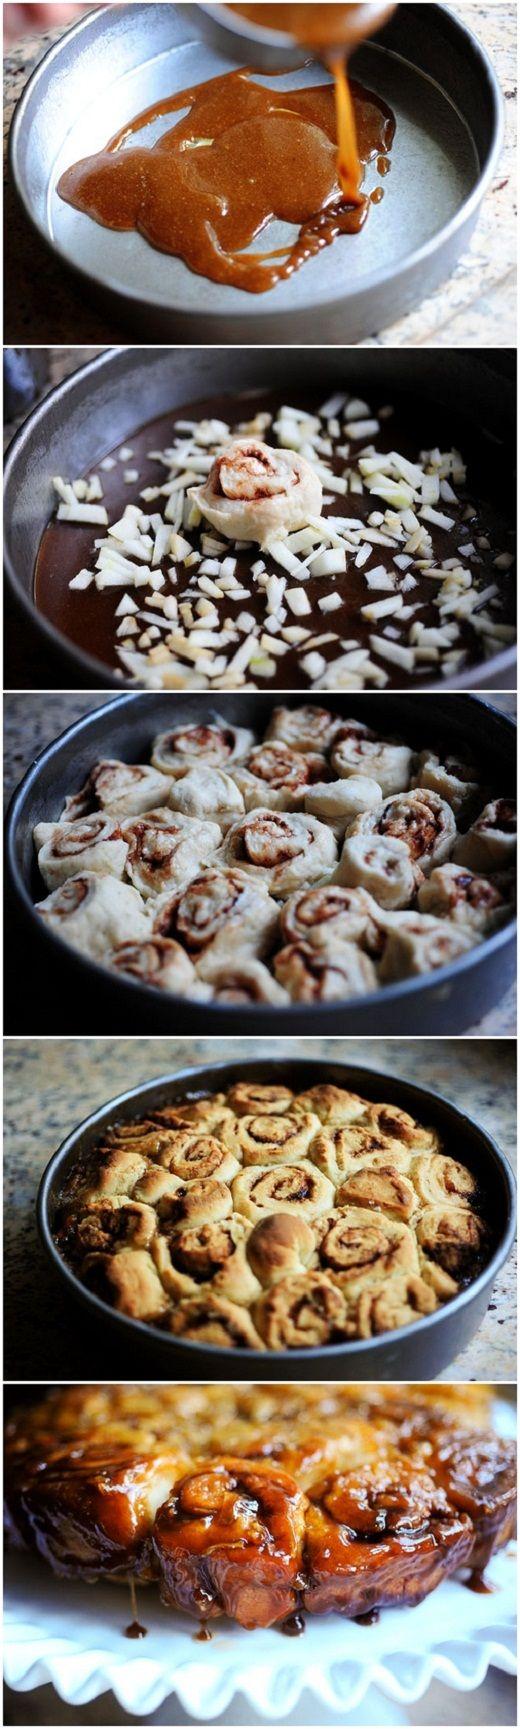 17 Best images about Monkey bread on Pinterest   Pumpkins ...